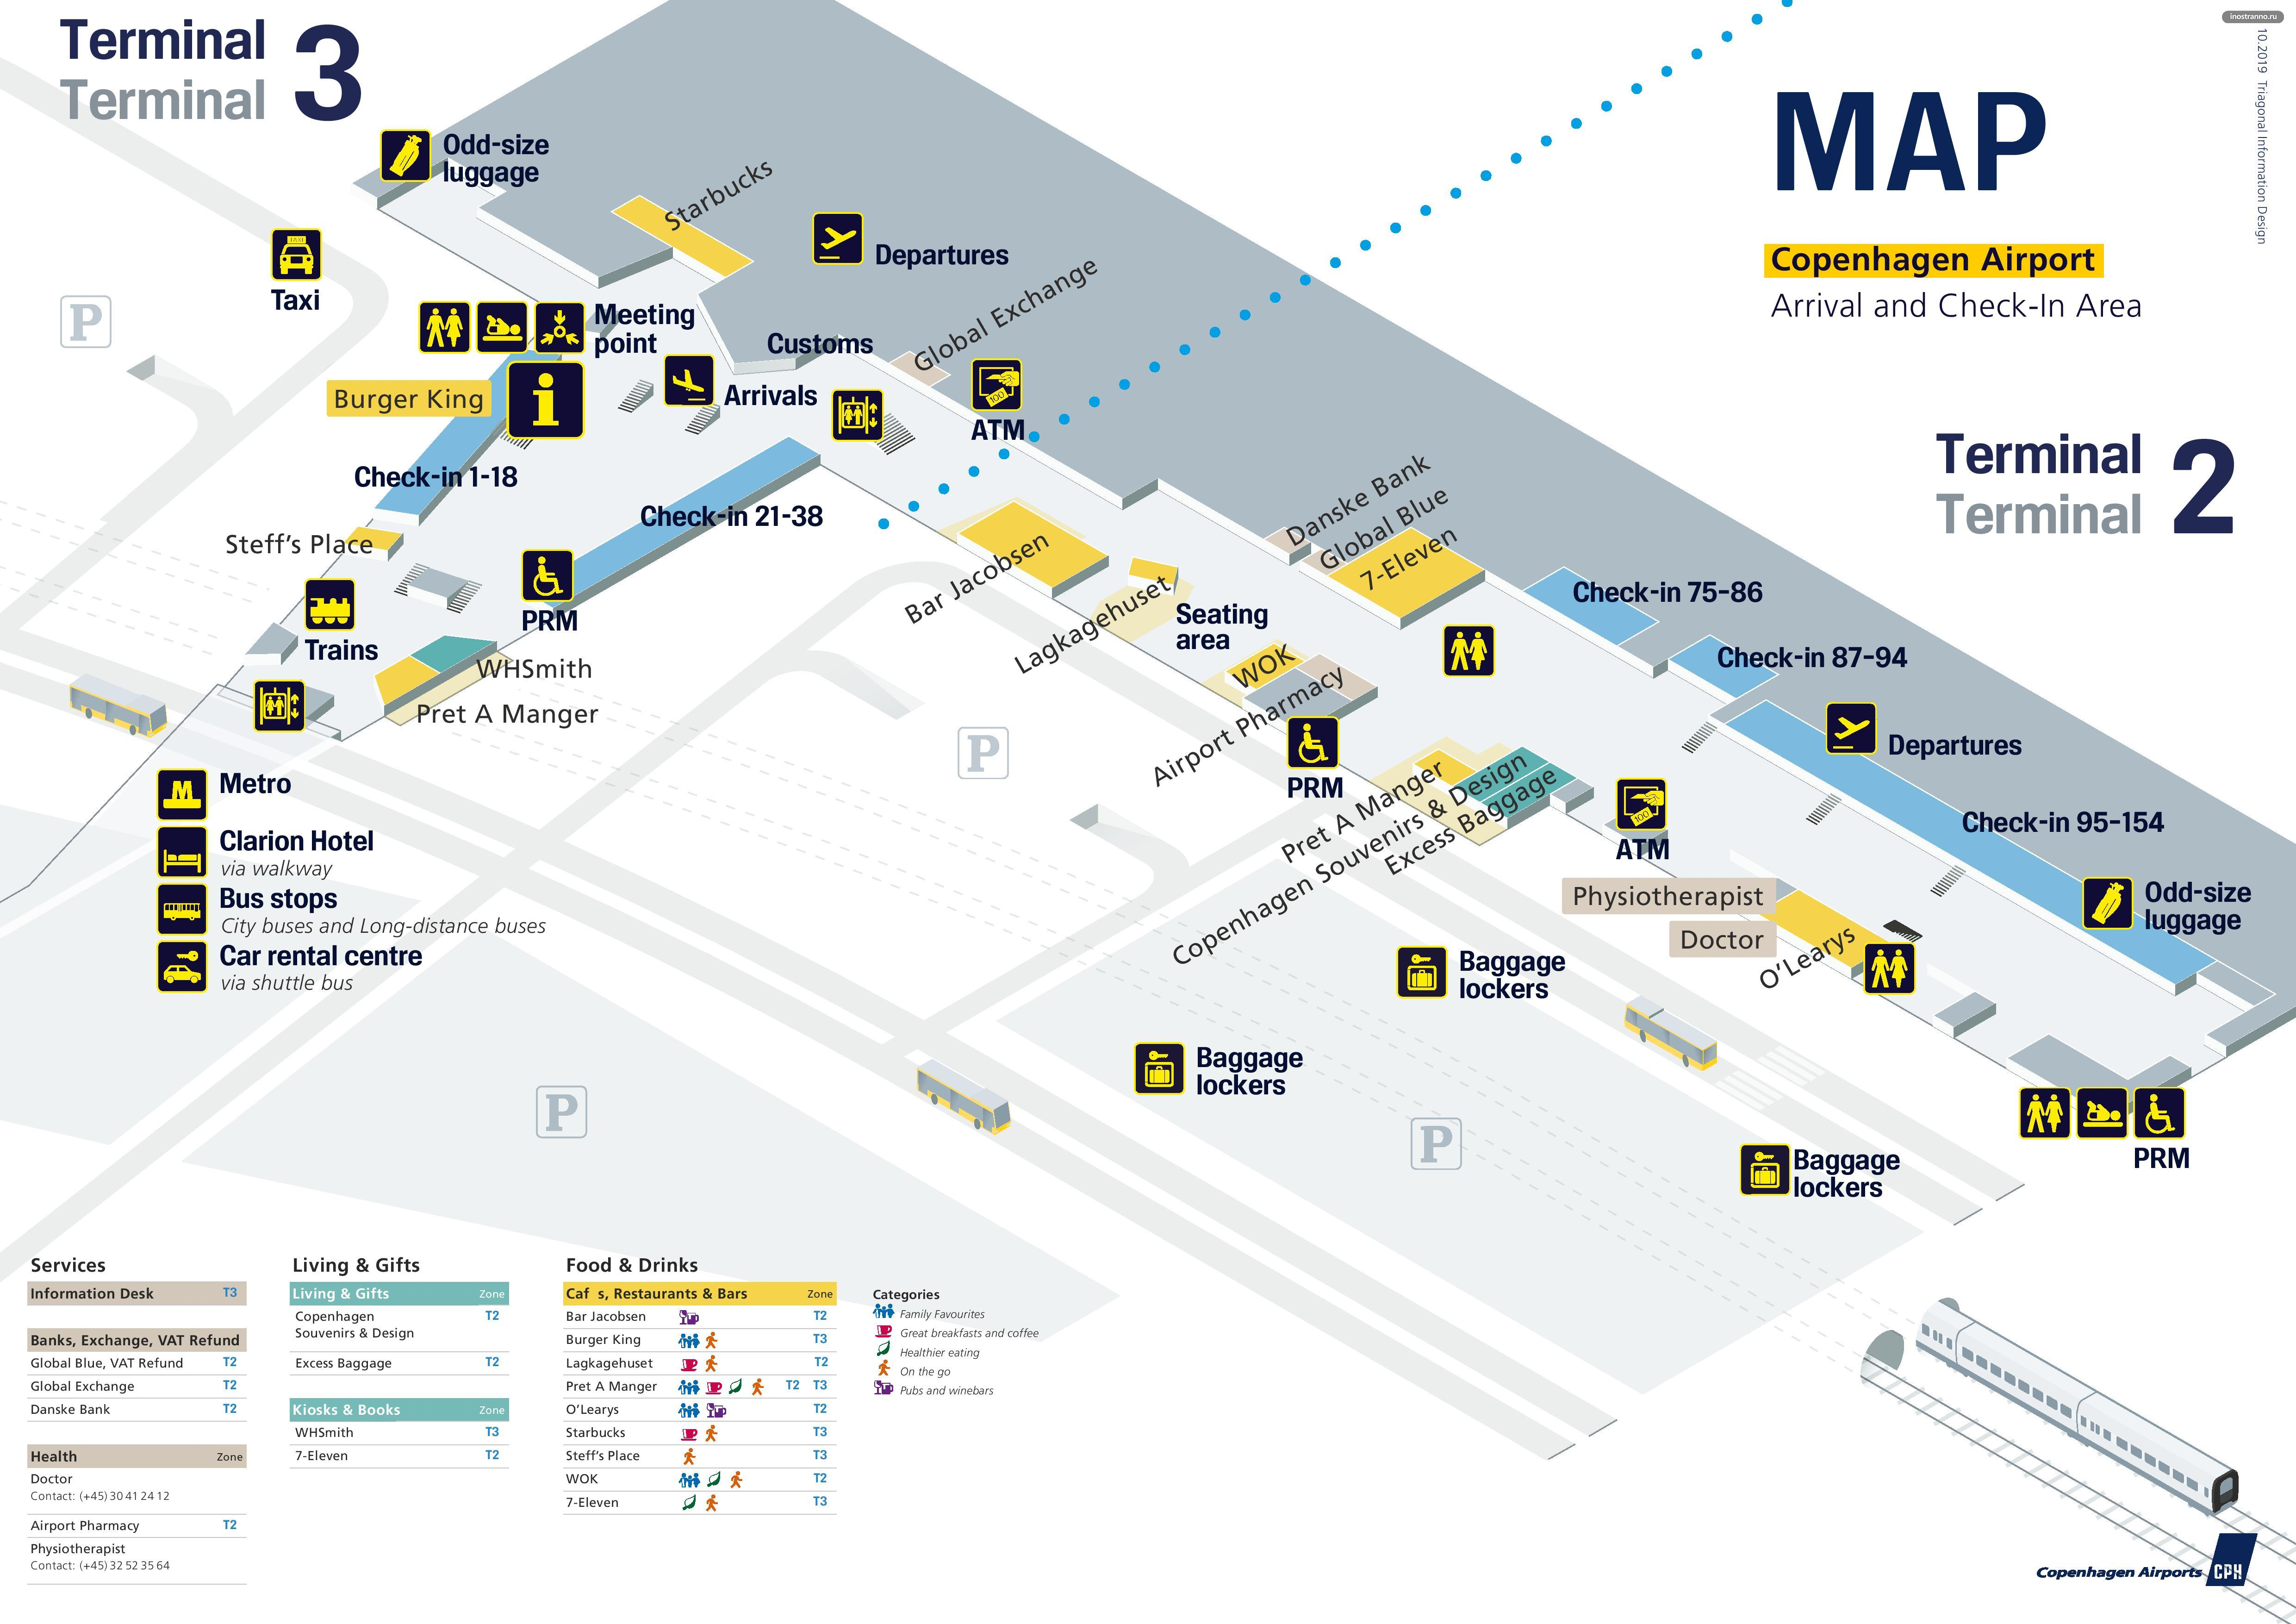 Карта аэропорта Копенгагена